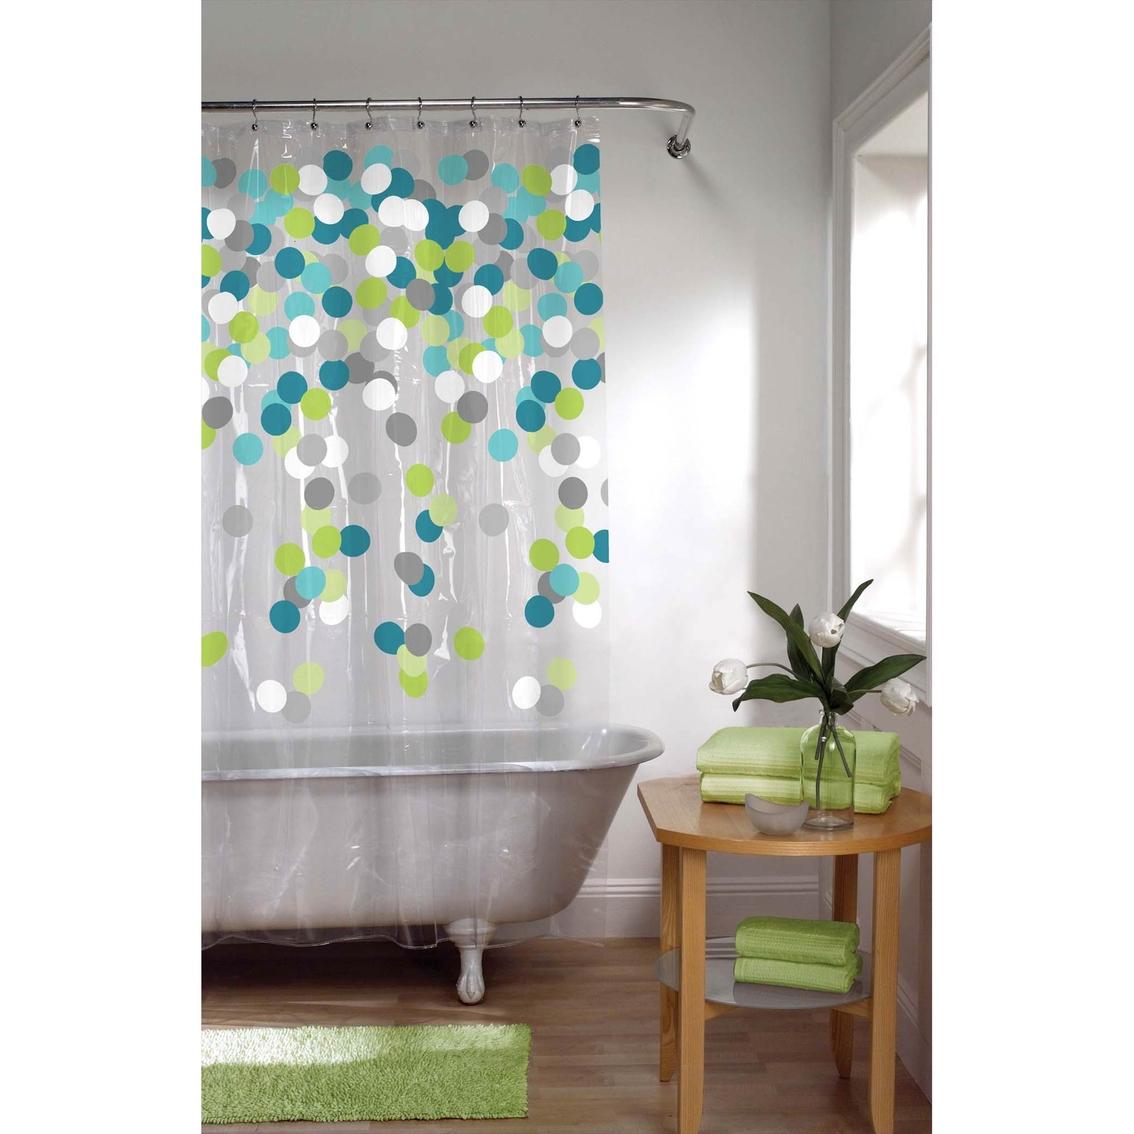 Maytex Cheer Blue/green Peva Shower Curtain   Shower Curtains ...